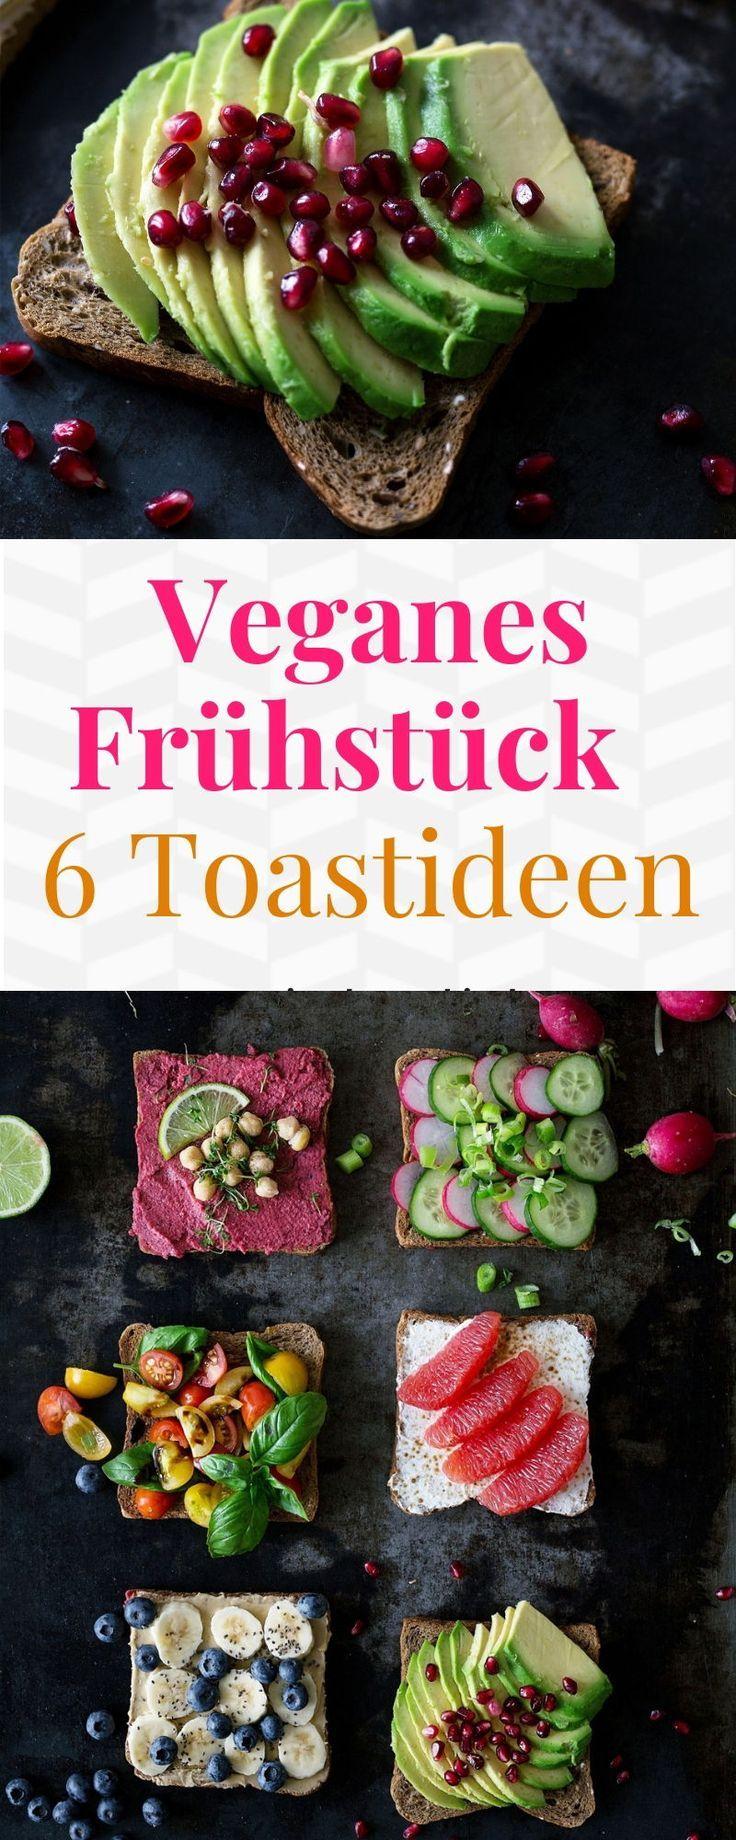 Toast Toastideen Frühstück vegan Frühstück vegan deftig Frühstück   Food If only I had time